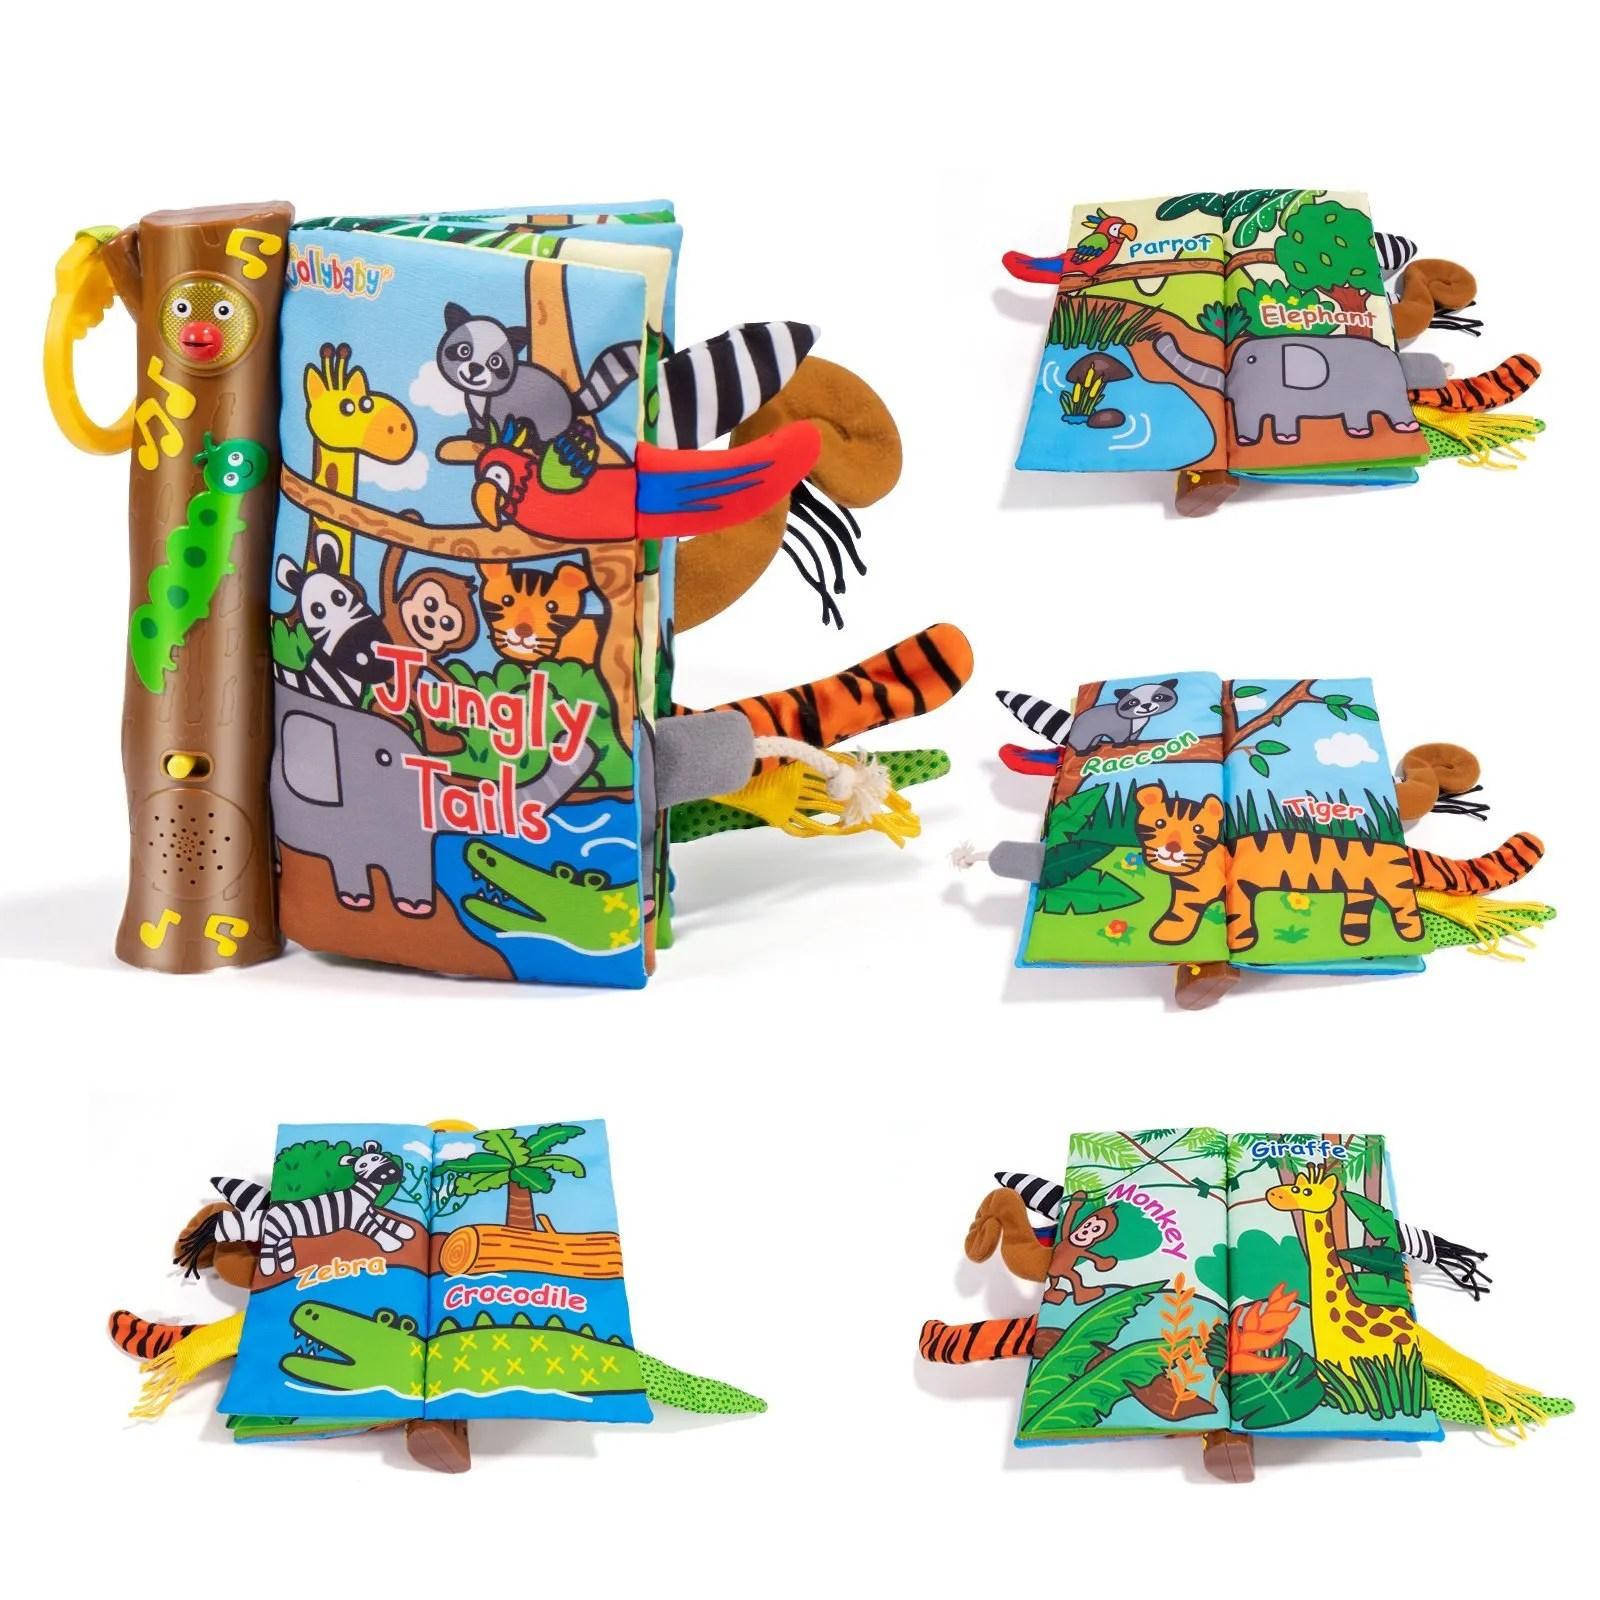 Musical Jungle tails soft book